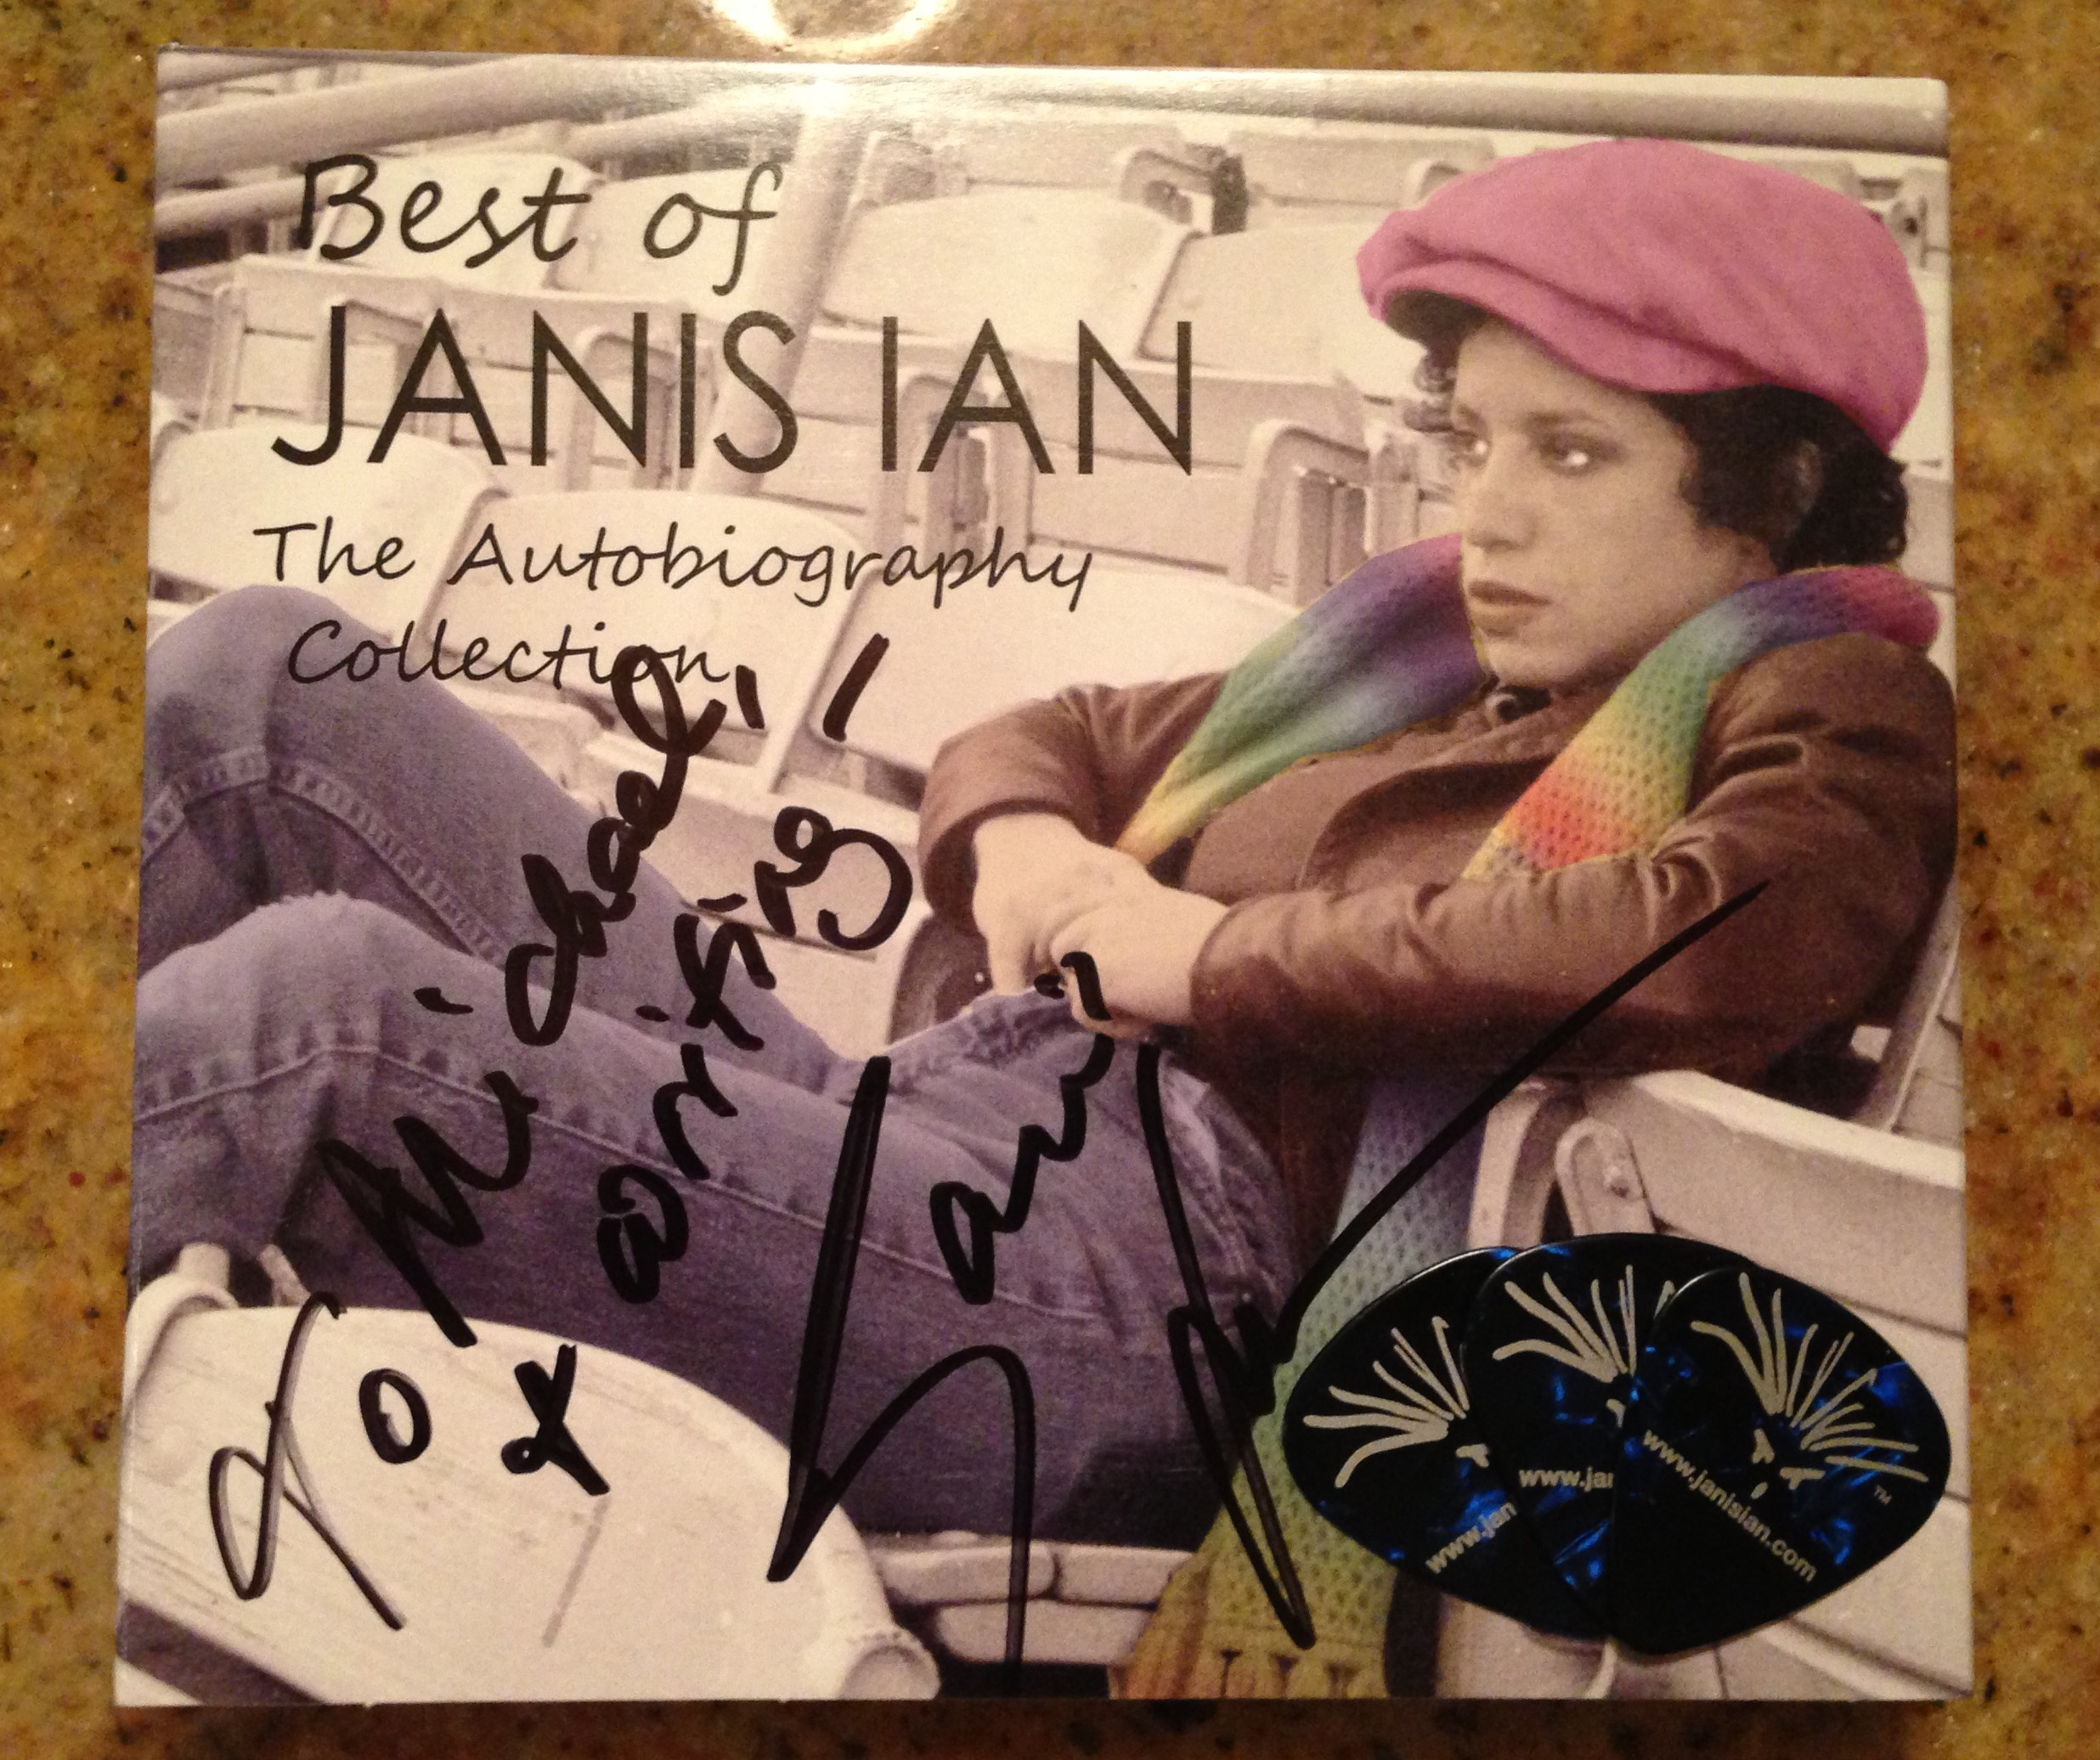 When I Met Janis Ian Michael Cavacini